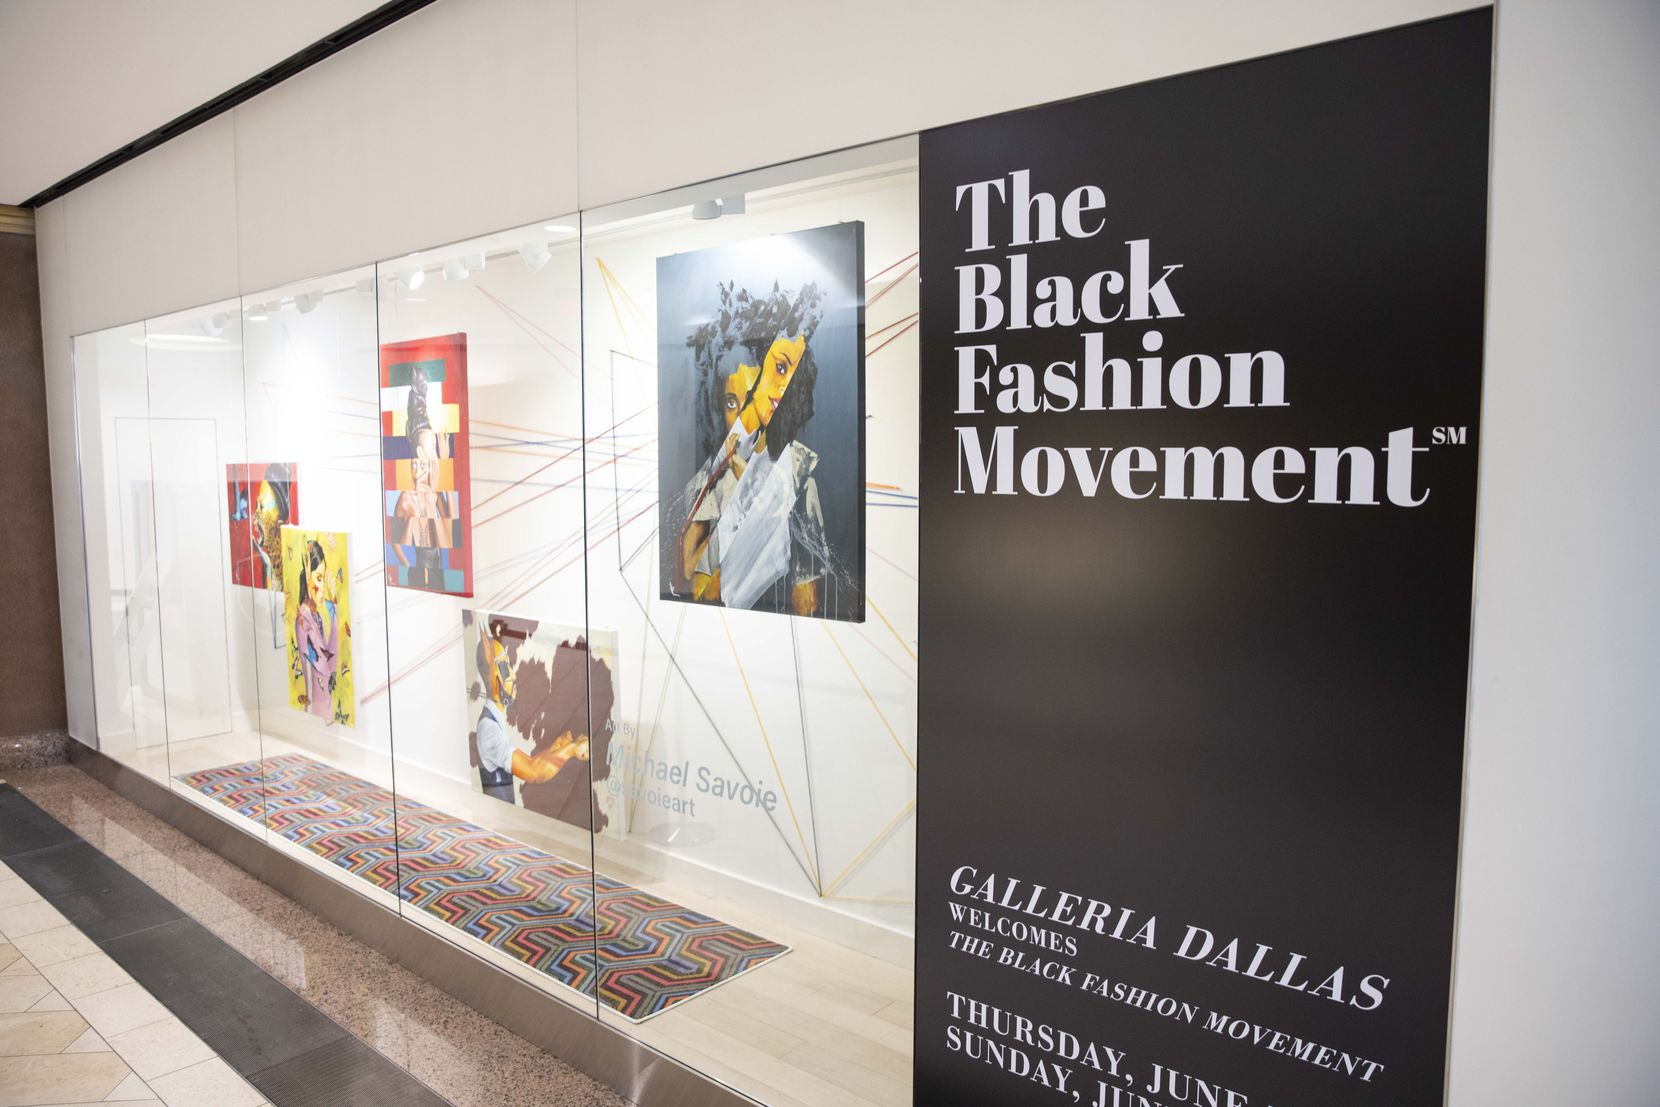 The Black Fashion Movement pop-up runs through Sunday at the Galleria.